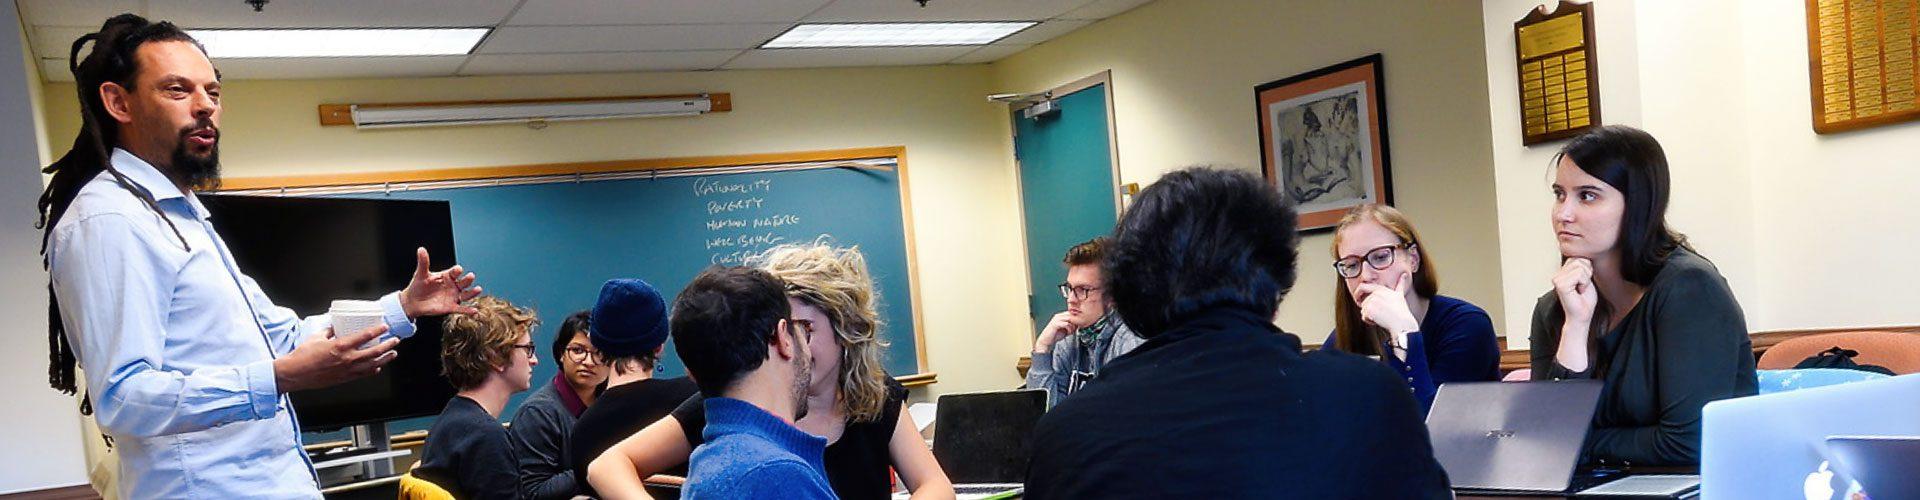 Professor Robbie Shilliam teaching graduate seminar